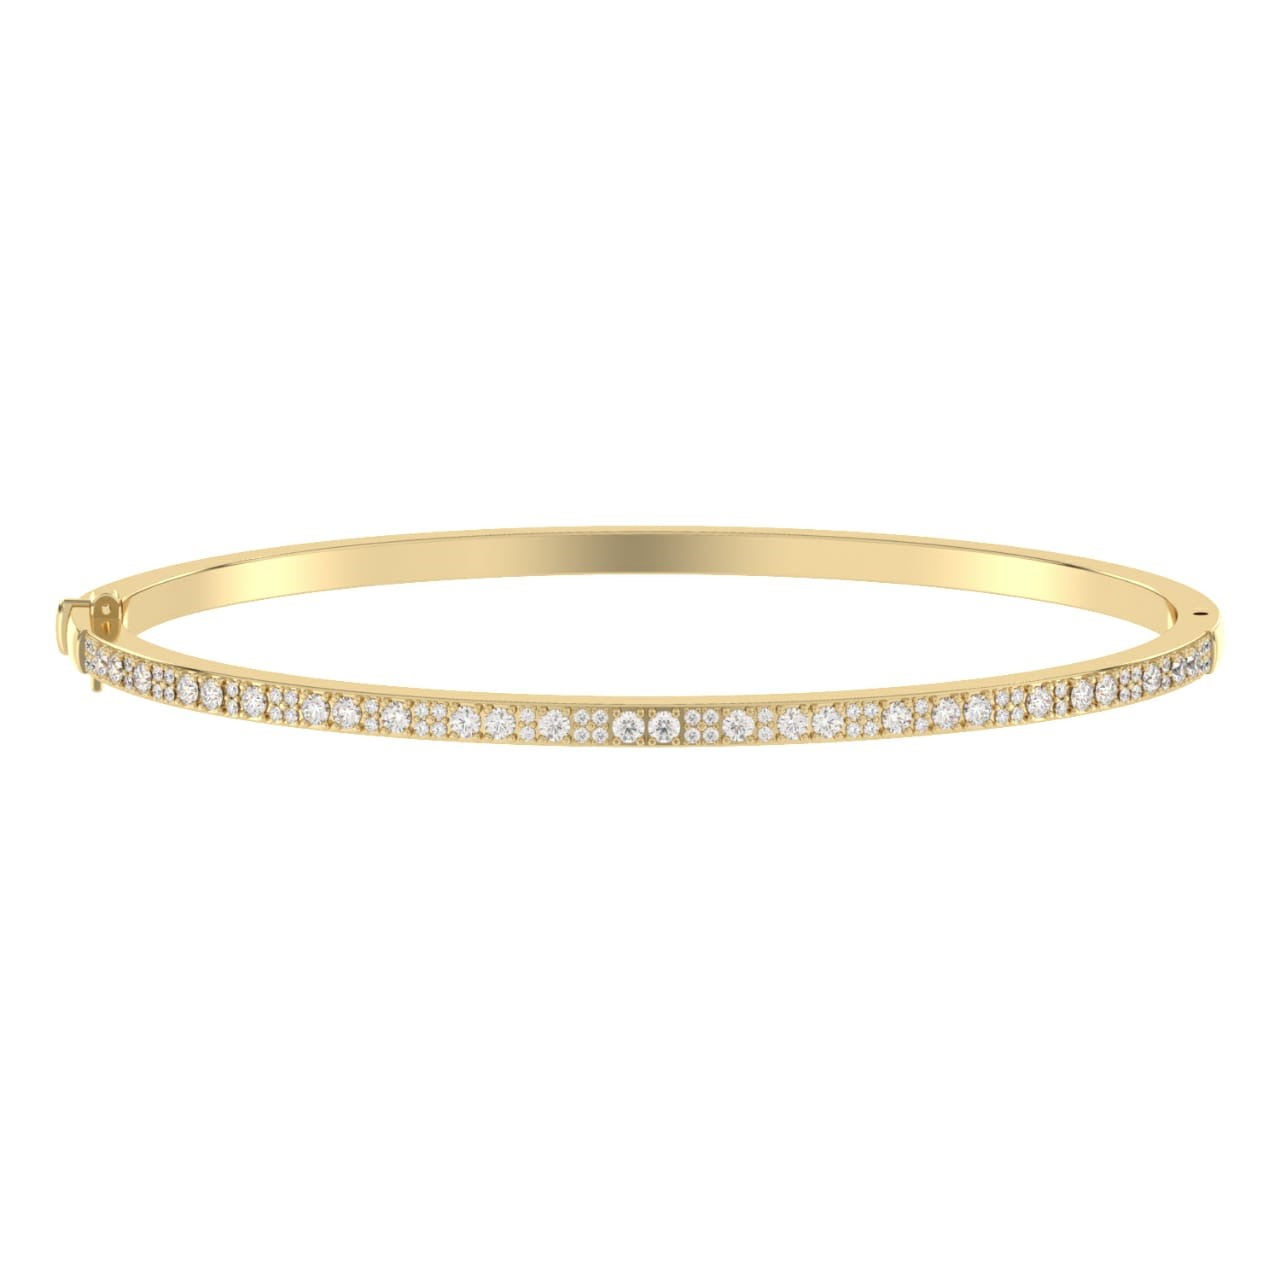 Chloe Gold Diamond Bracelet